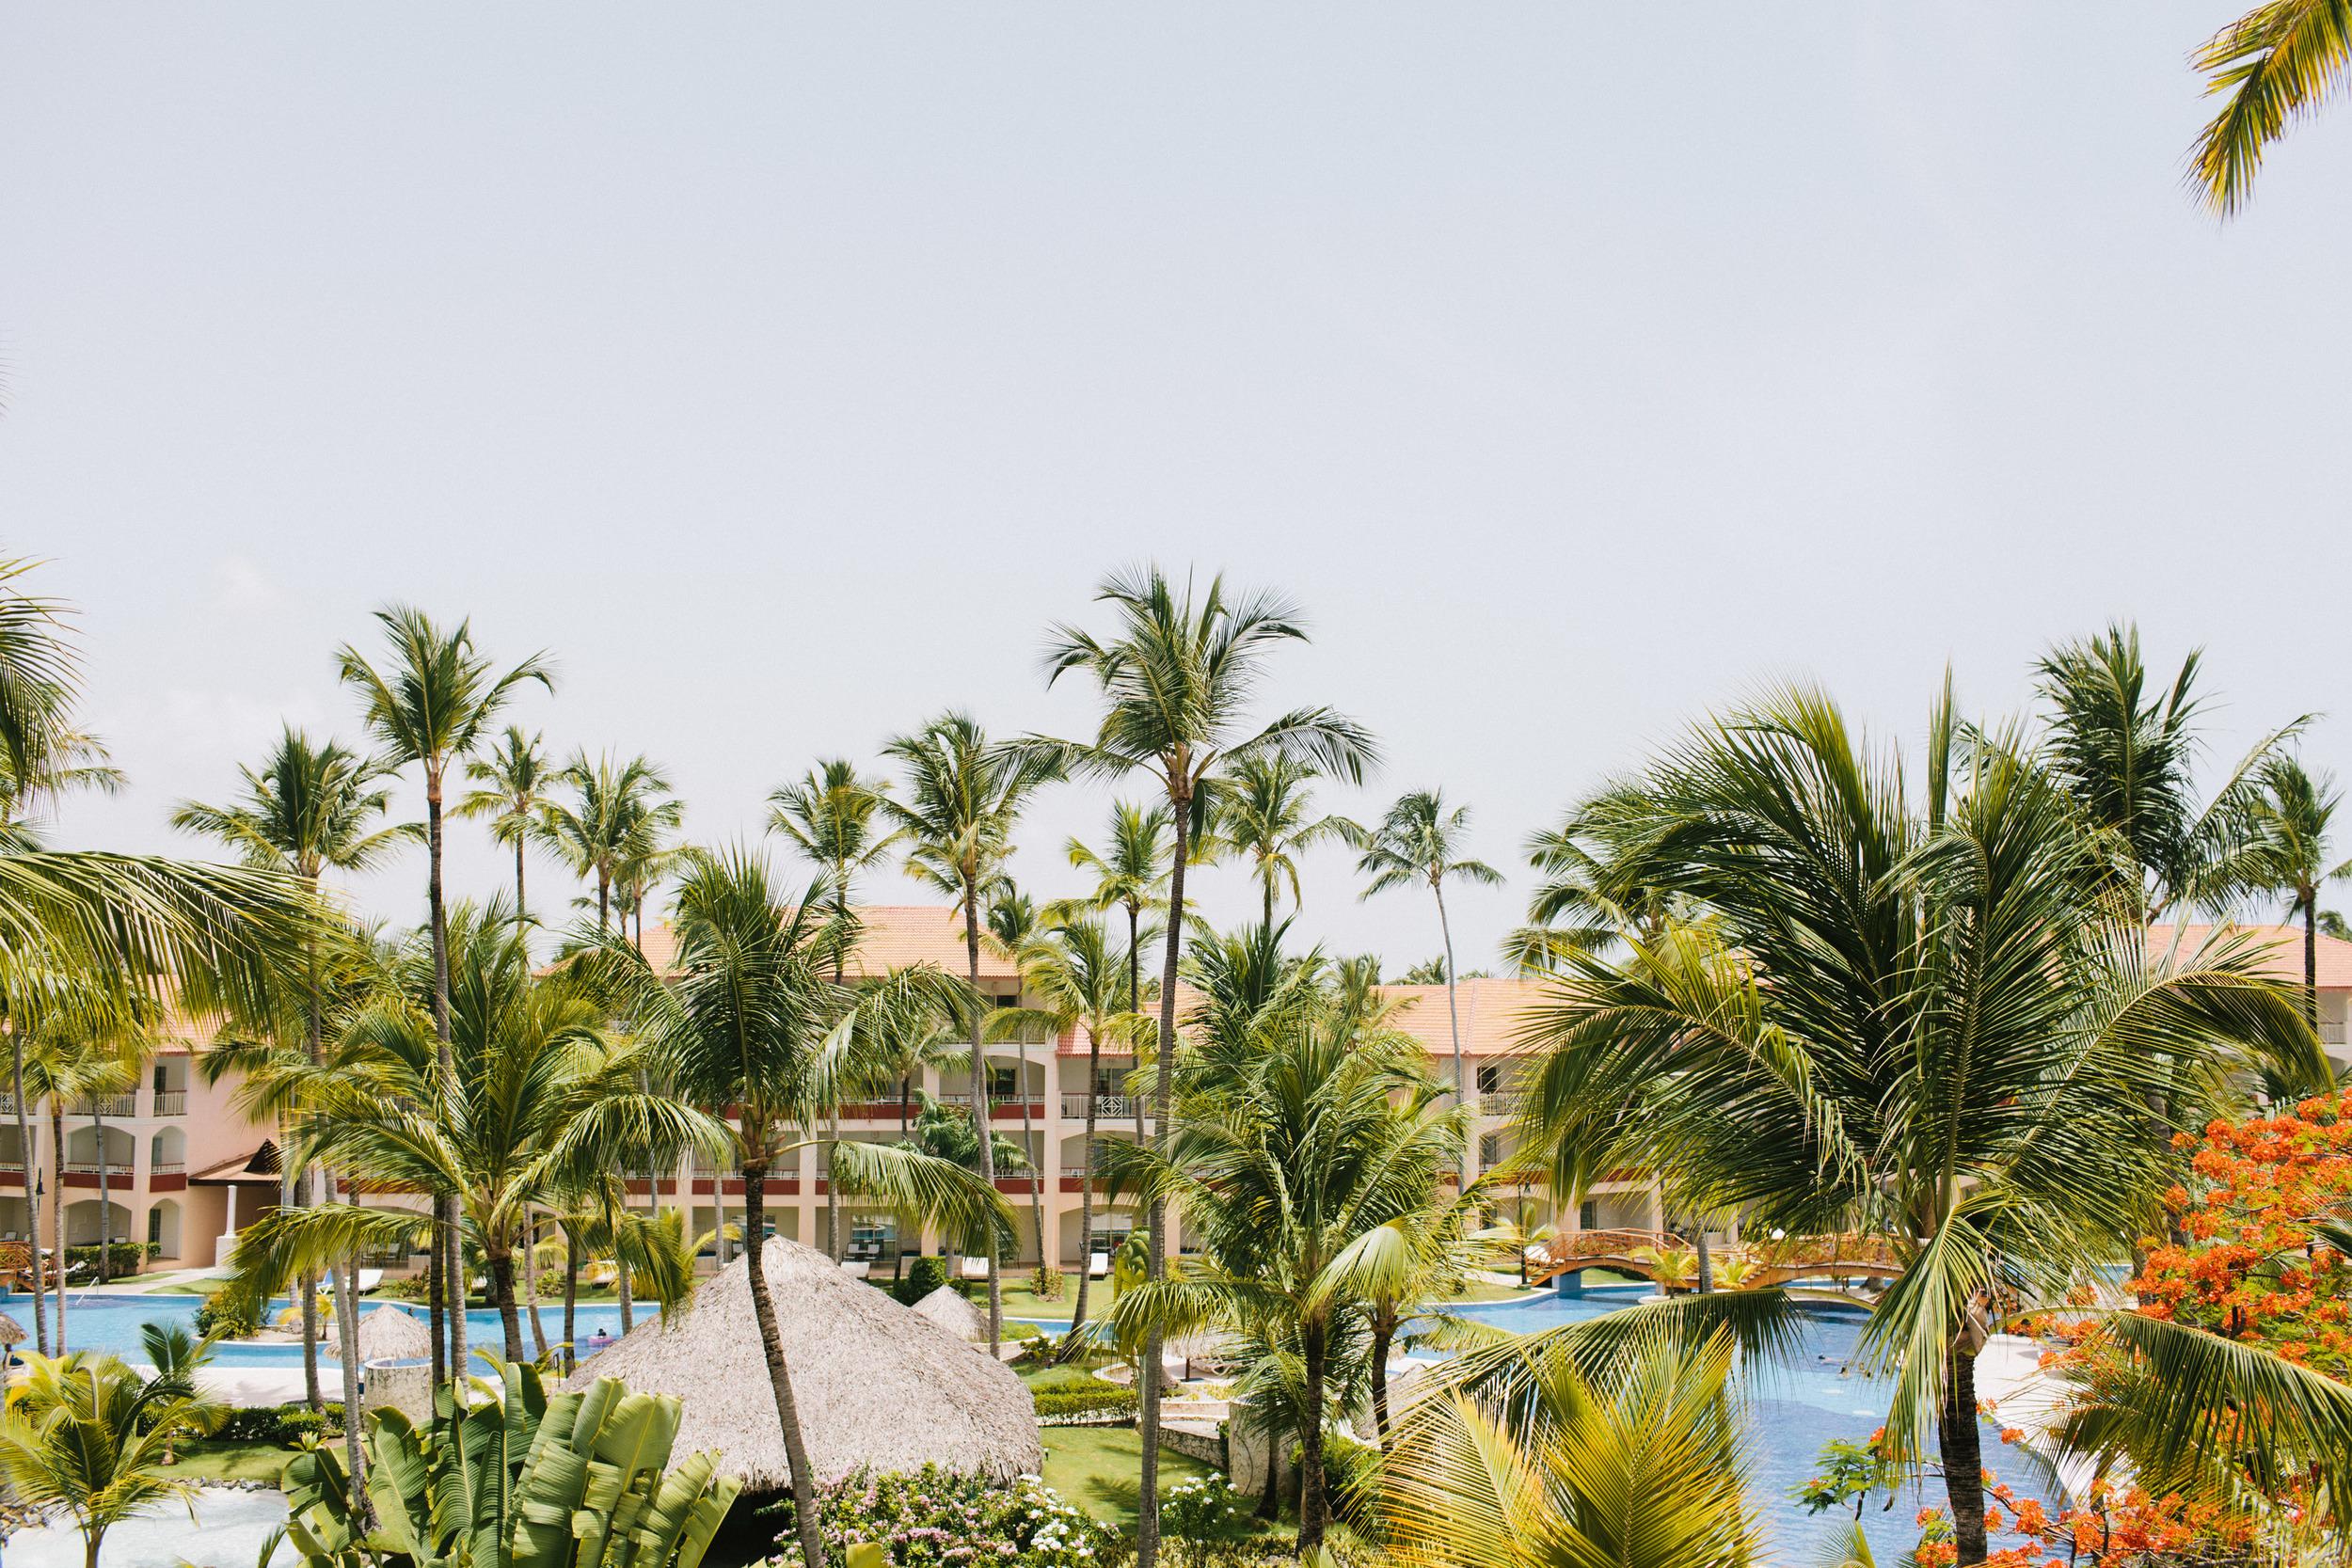 michael-rousseau-photography-dominican-republic-destination-wedding-cara-jason-colonial-majestic-dominican-republic038.jpg